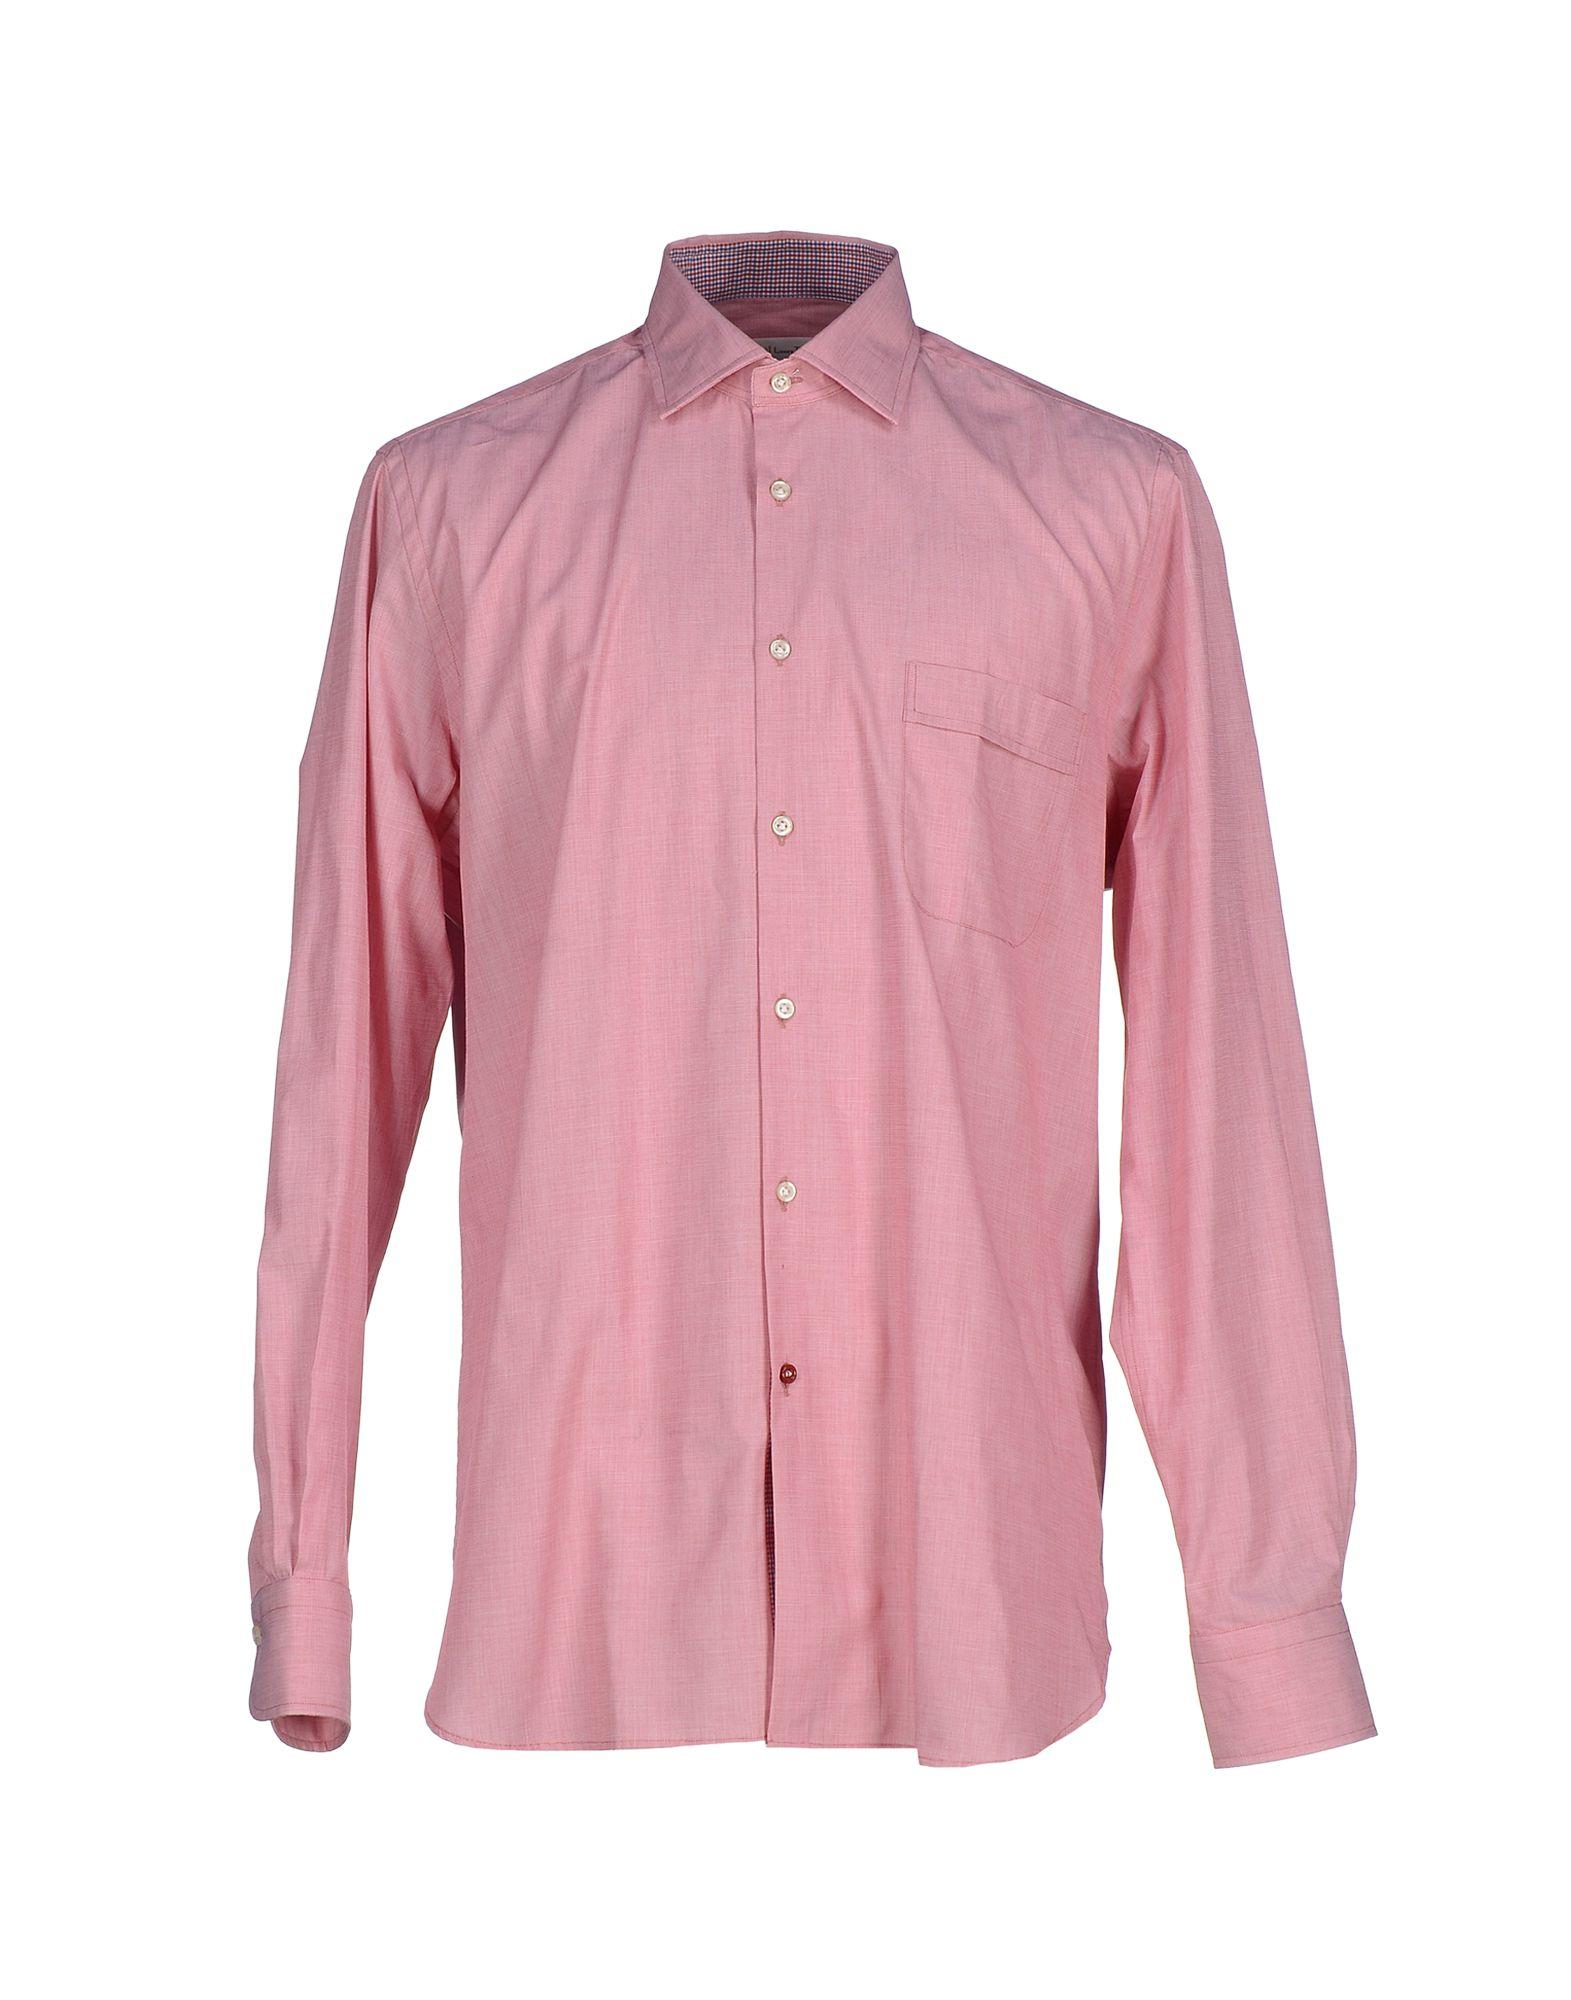 Lyst carrel shirt in pink for men for Mens pink shirts uk